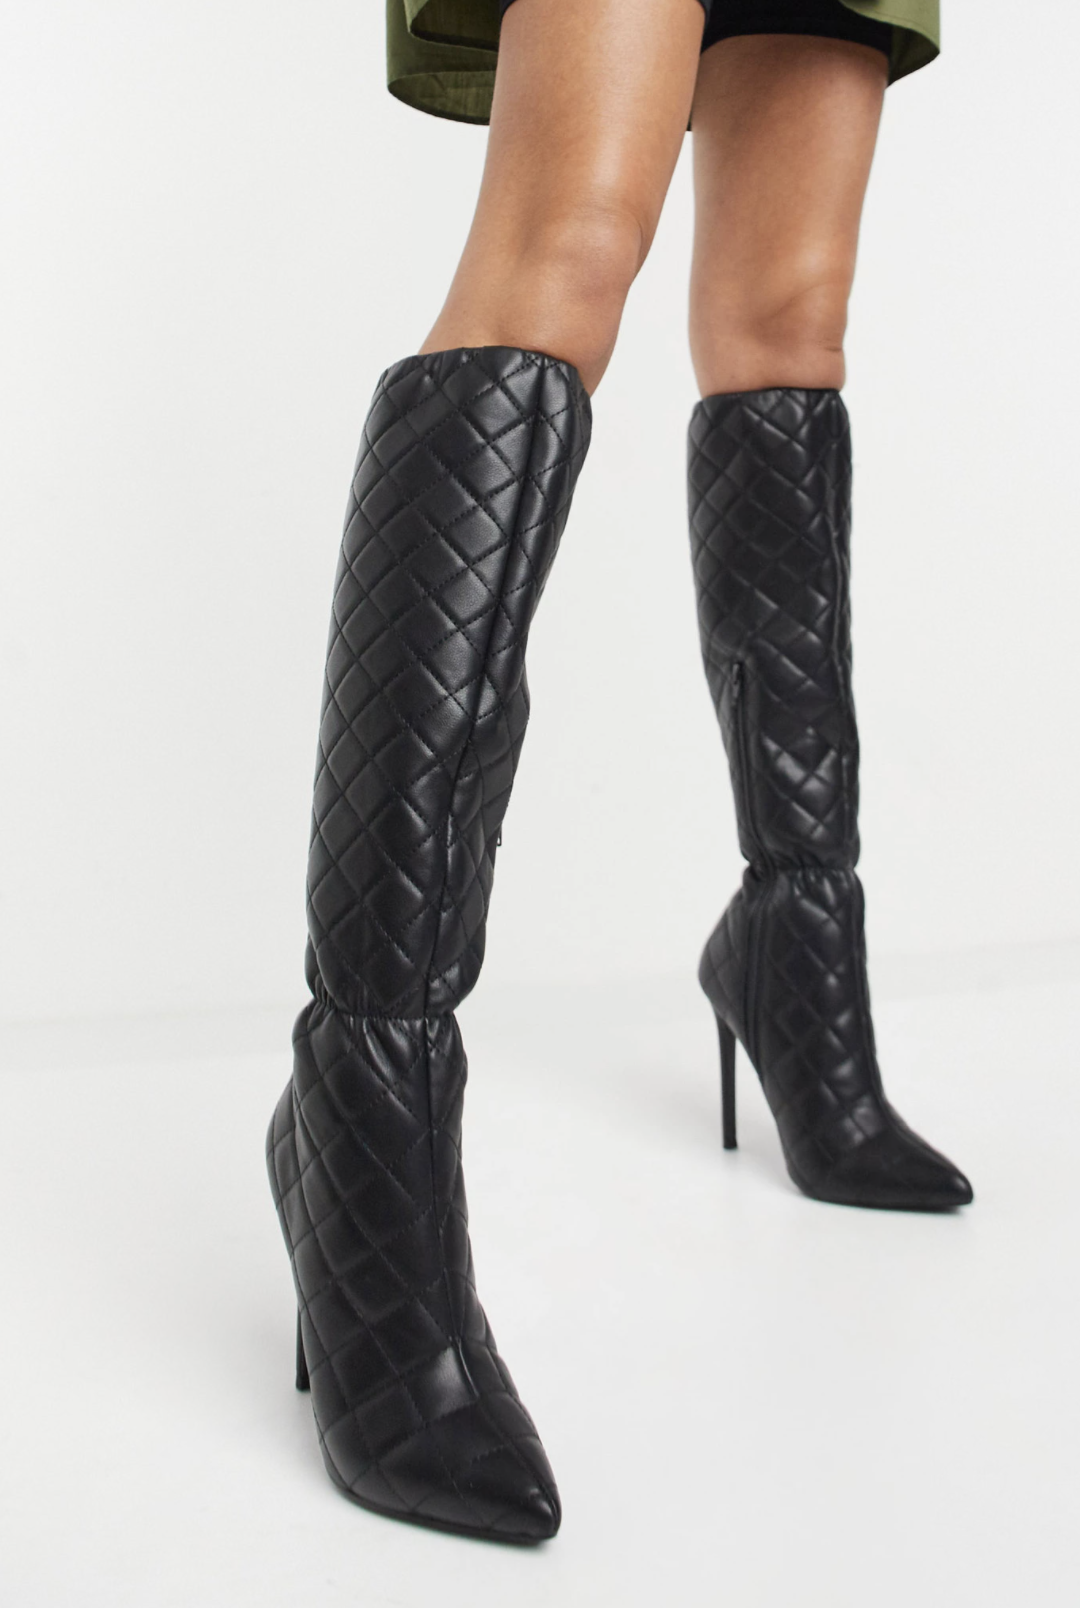 Botas por la rodilla negras acolchadas de tacón alto Cheryl de ASOS DESIGN